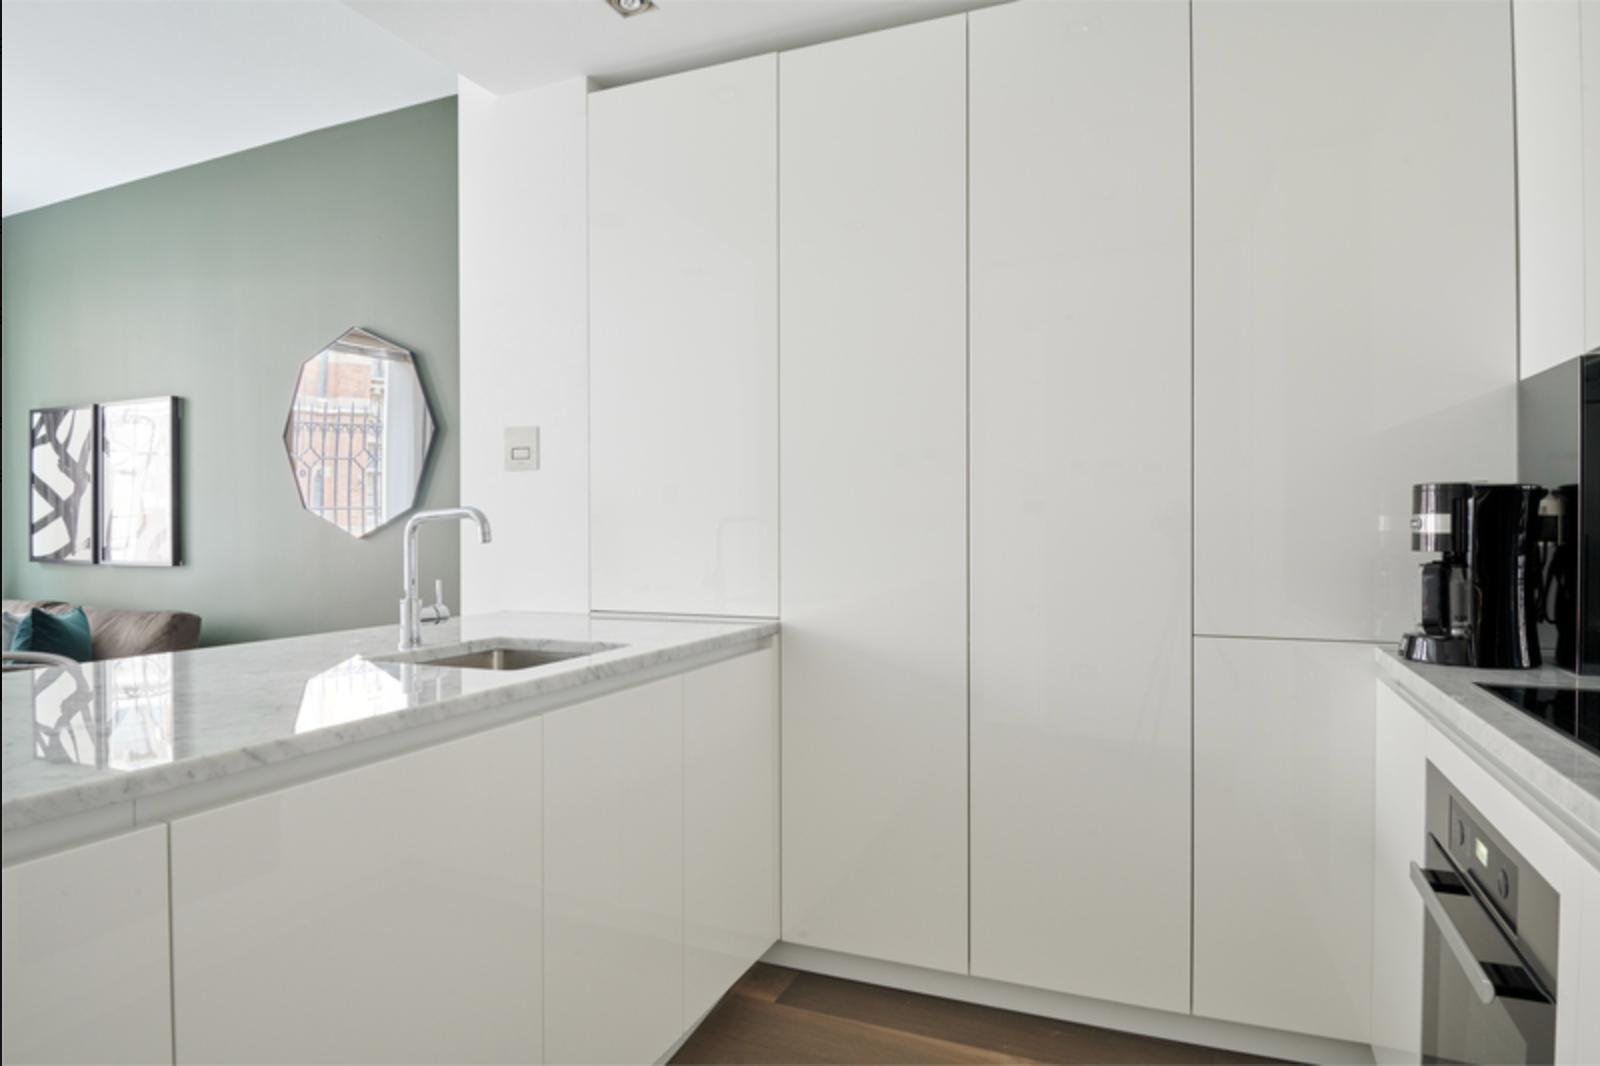 Kitchen at Bell Yard Apartments, City, London - Citybase Apartments